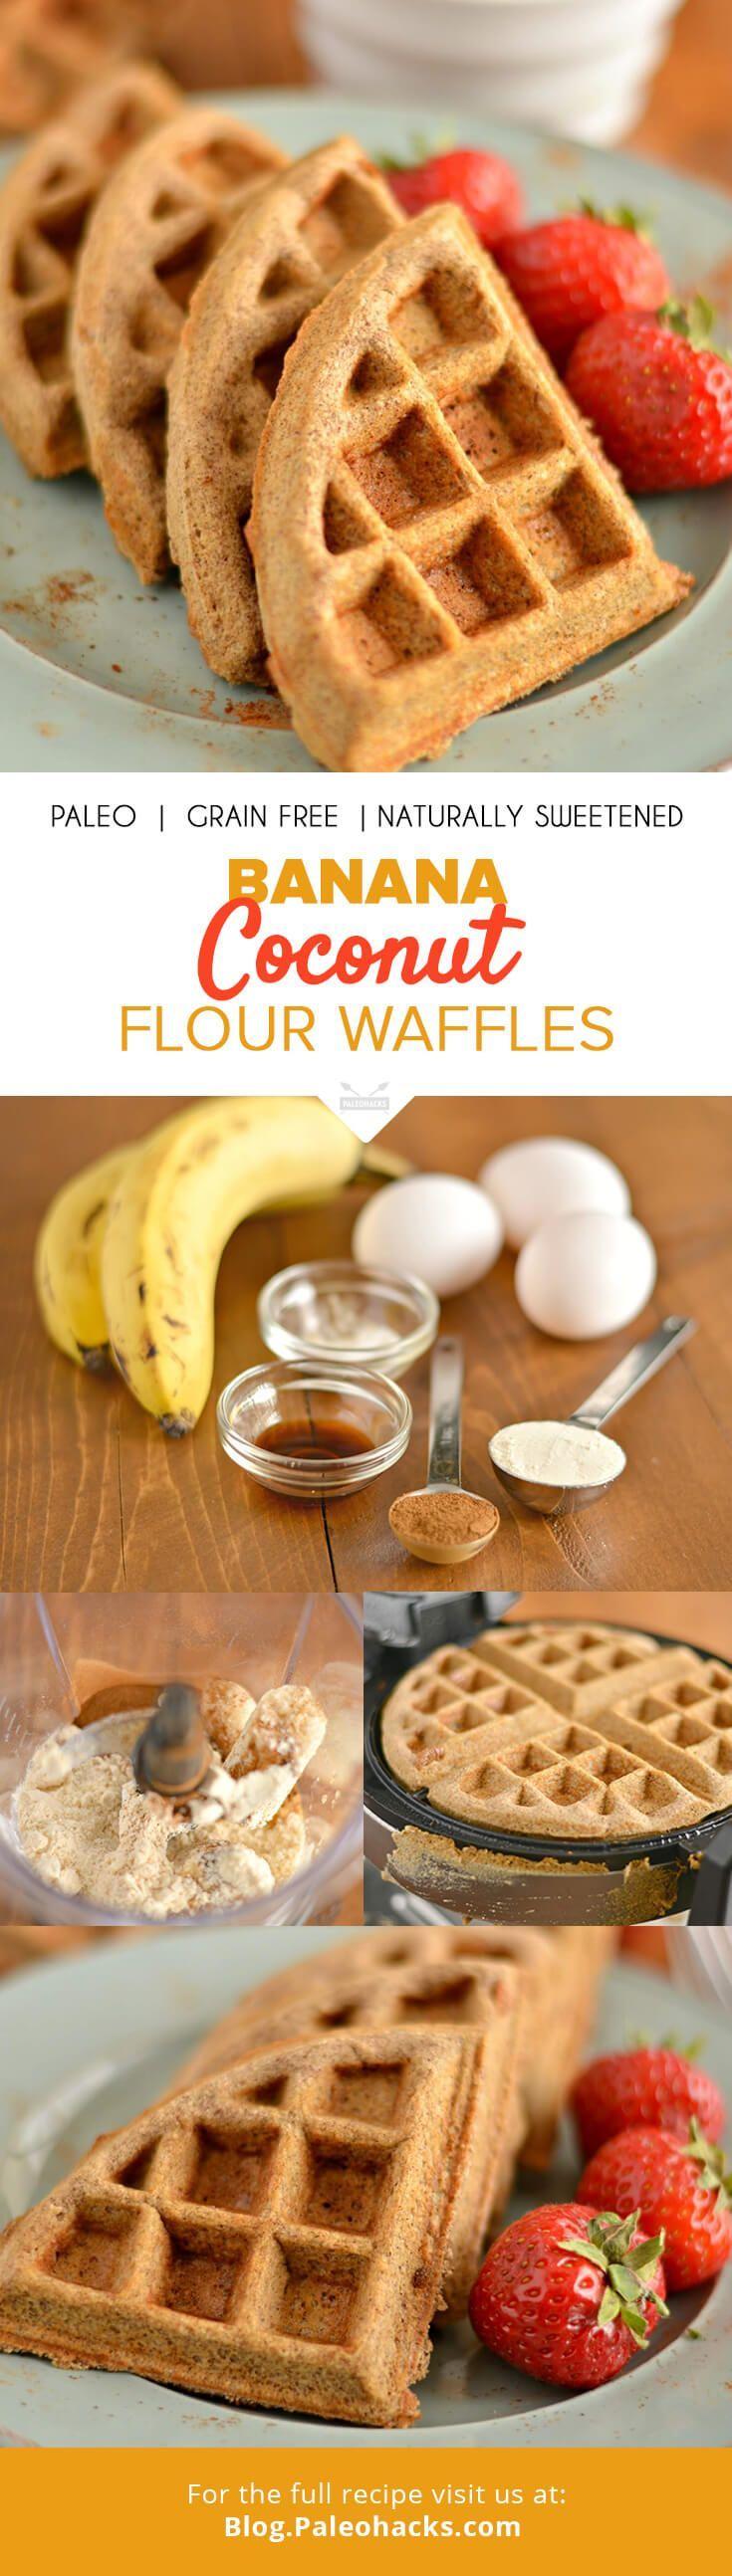 Traditional-PIN-Banana-coconut-flour-waffles.jpg